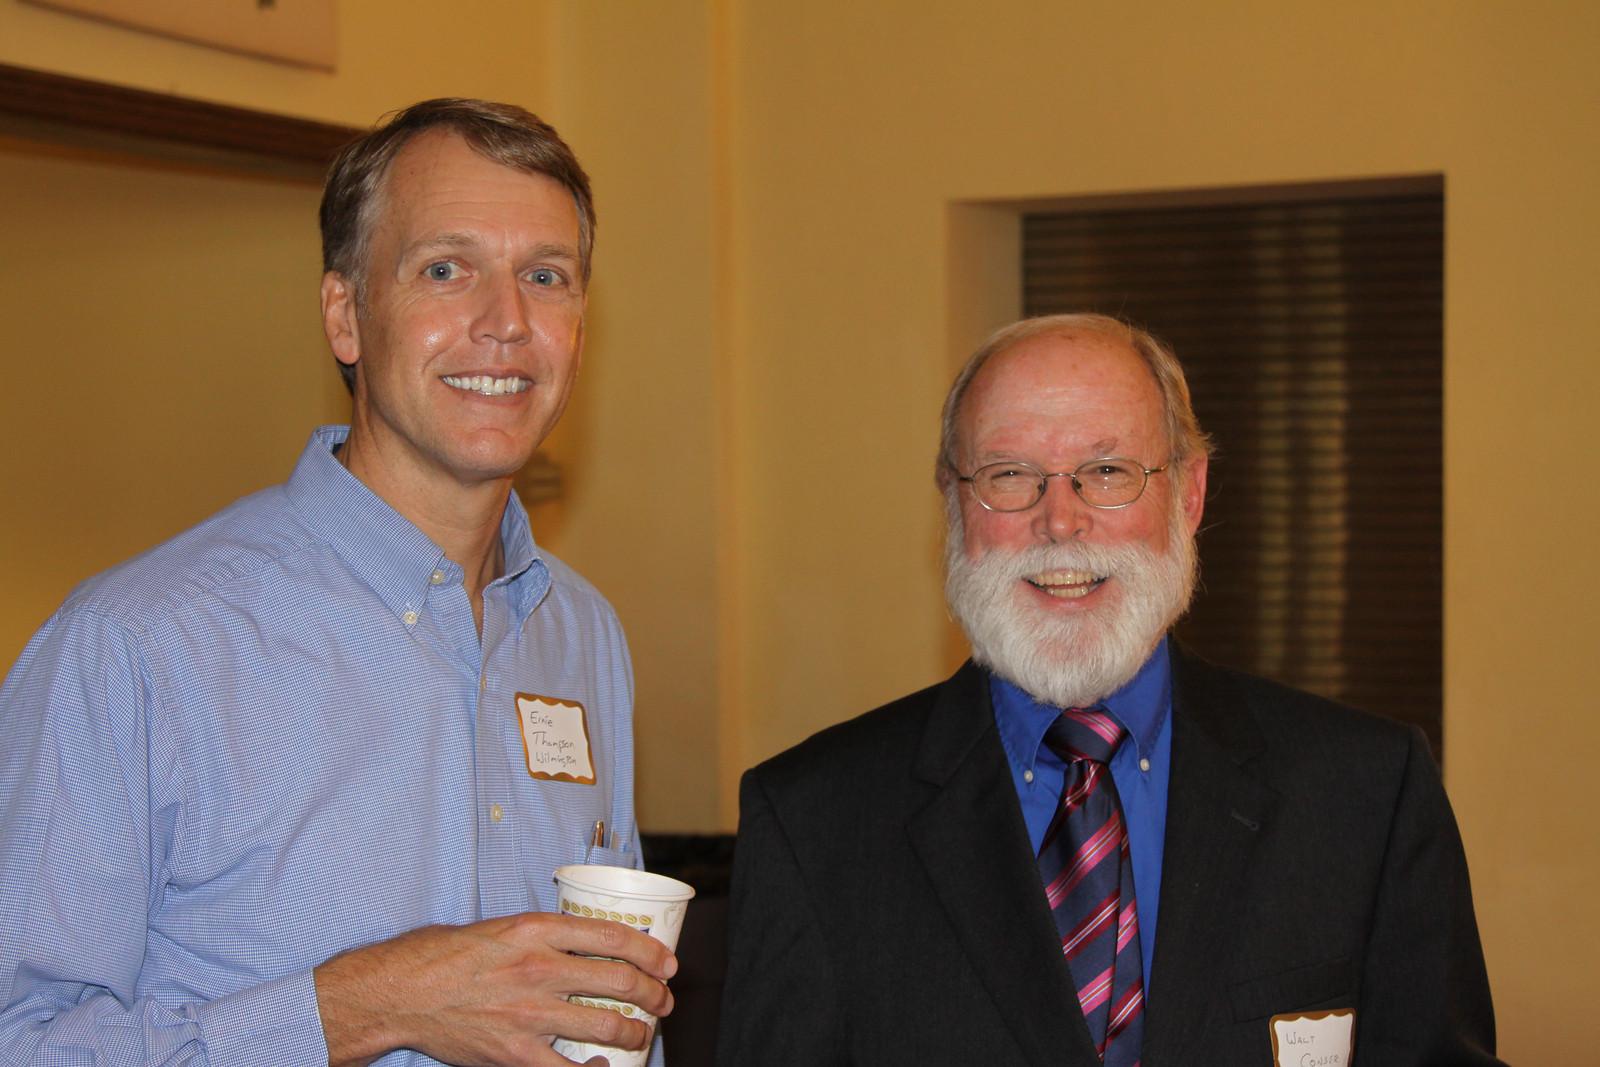 Ernie Thompson and Walt Conser